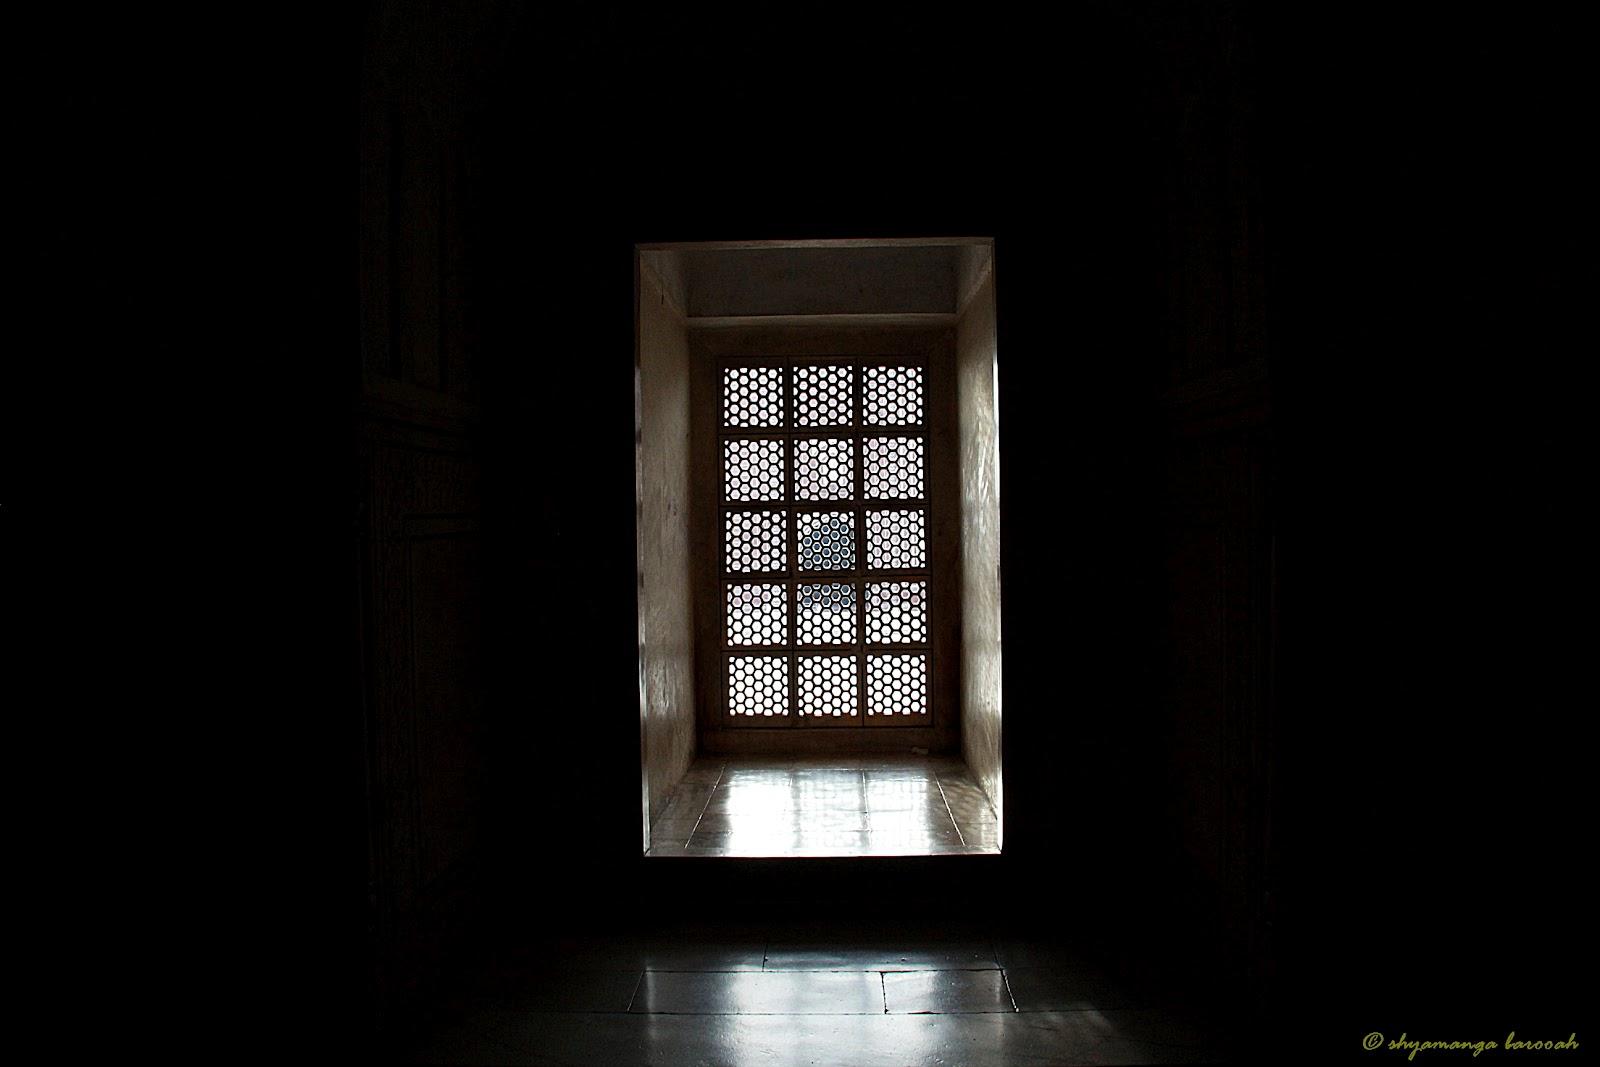 Doors \u0026 Windows & ballad of a lonesome hobo: Doors \u0026 Windows